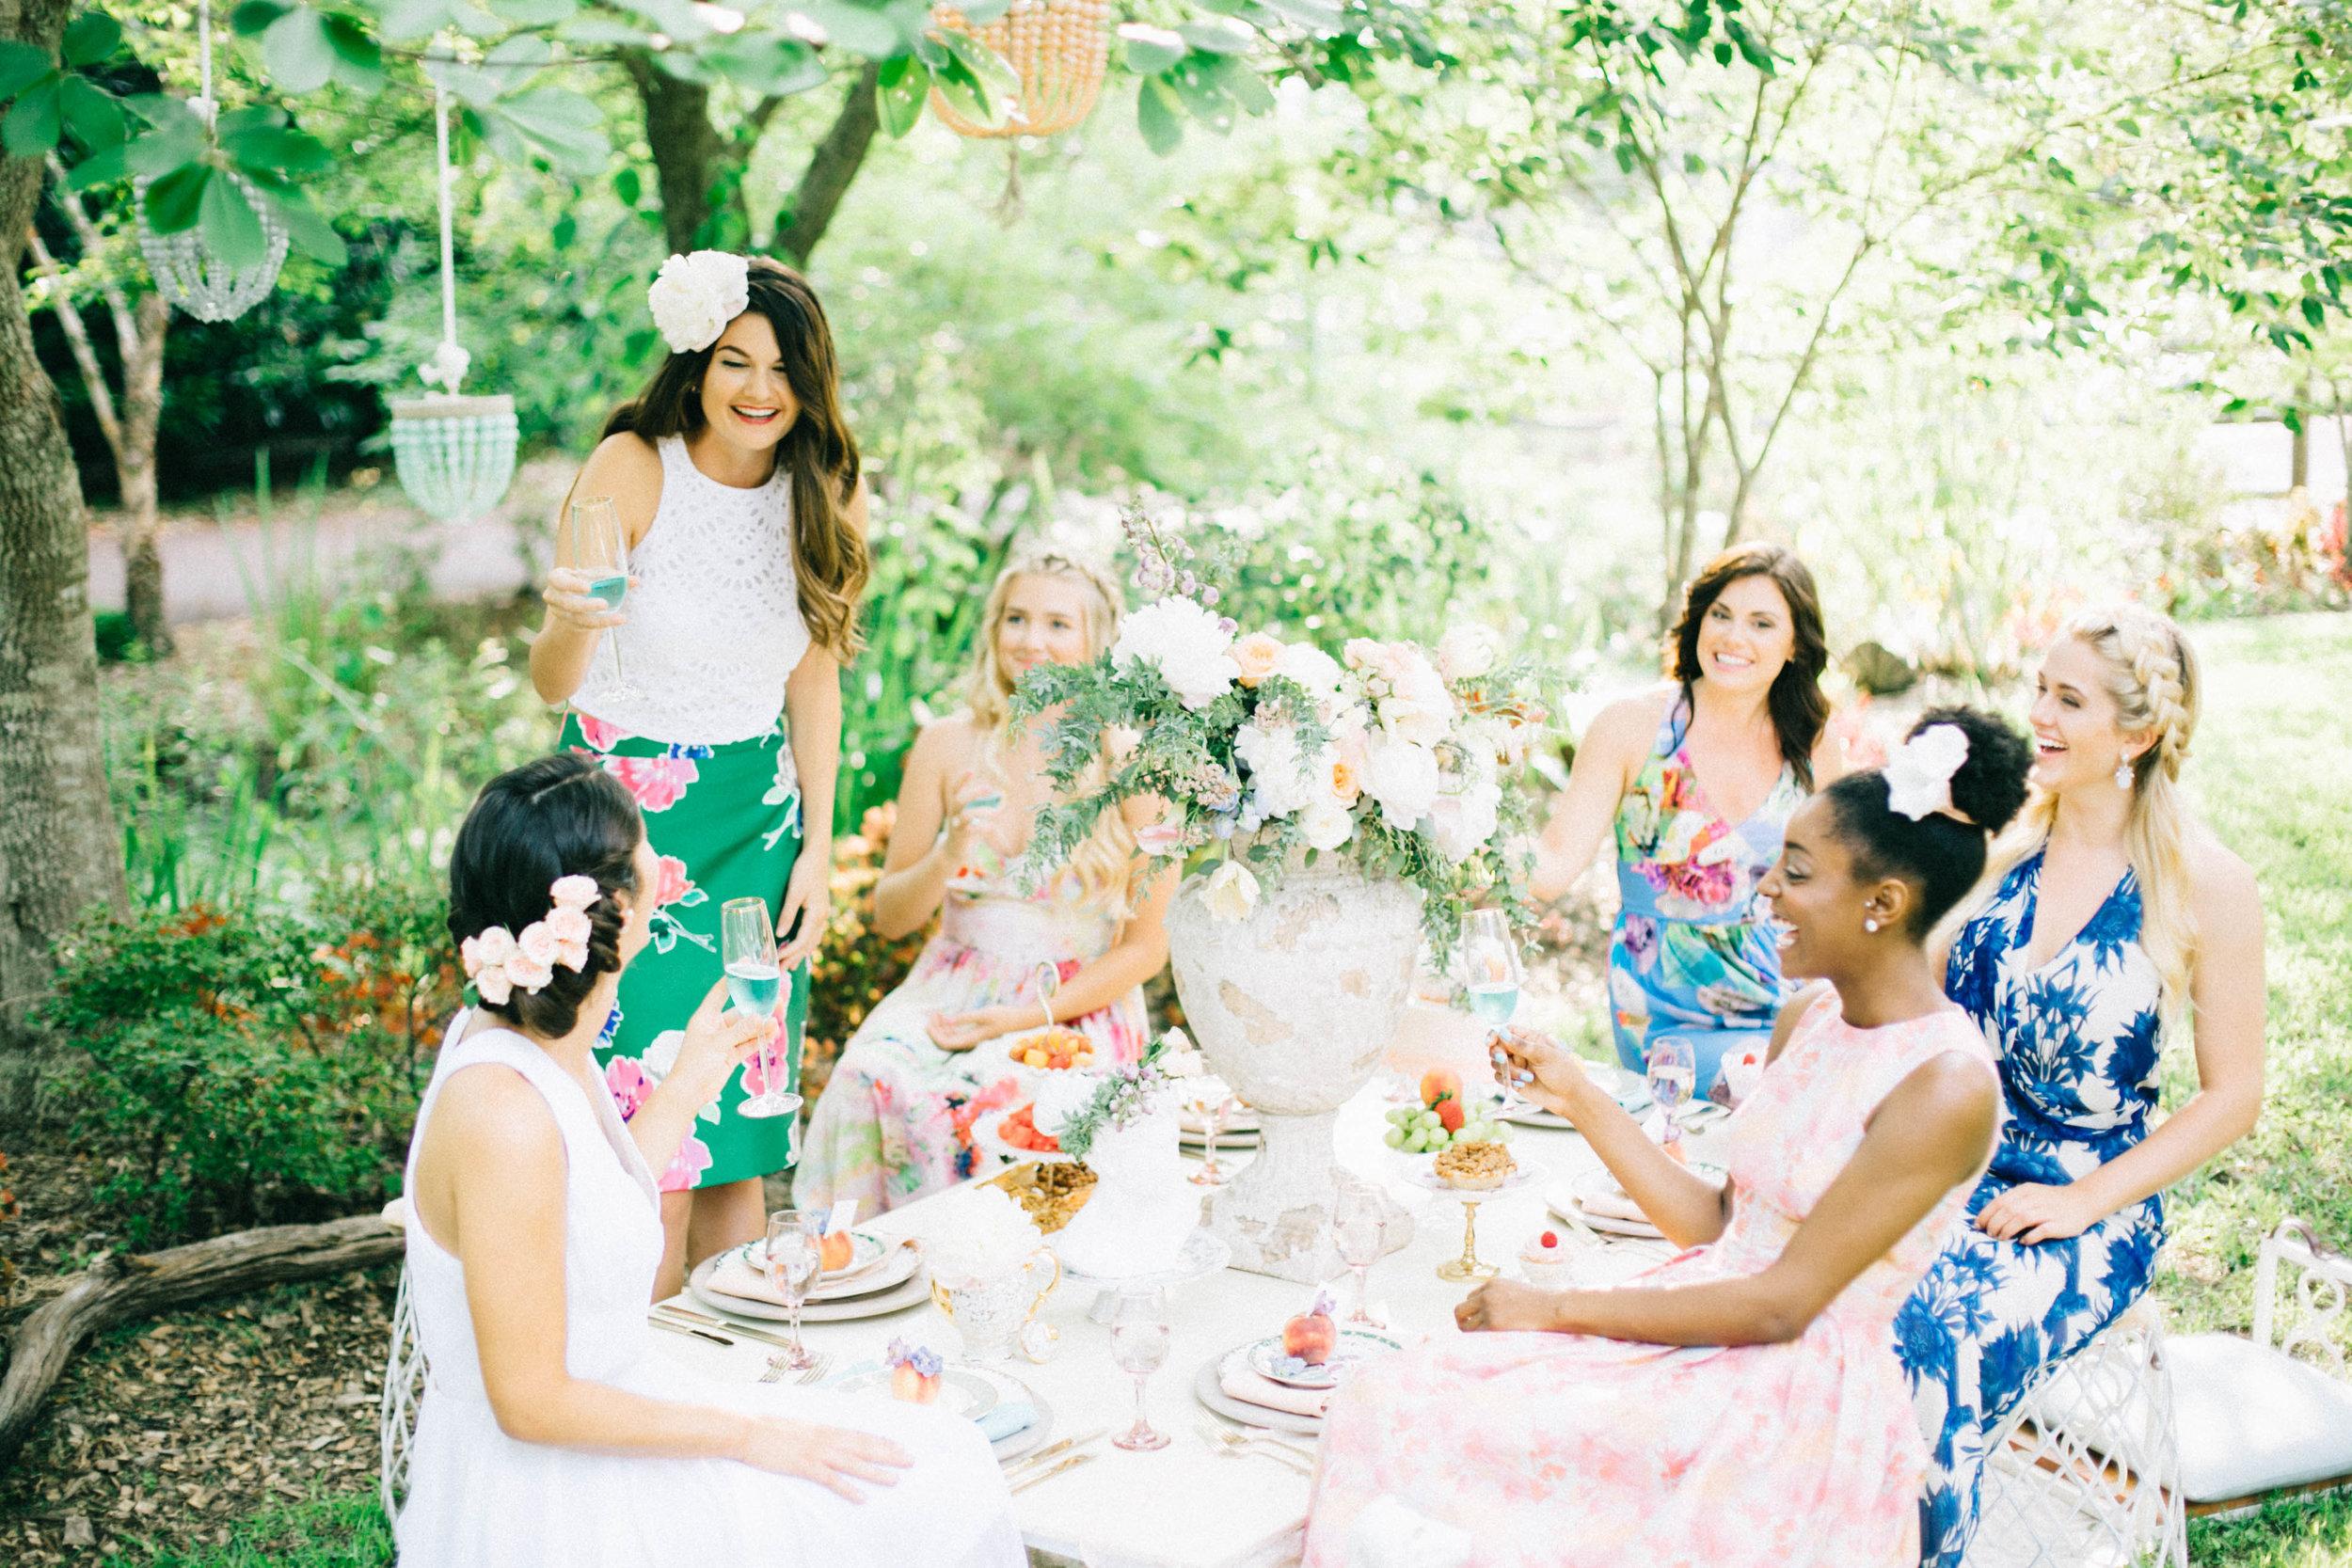 cypress gardens charleston bridal shower wedding planners (108).jpg